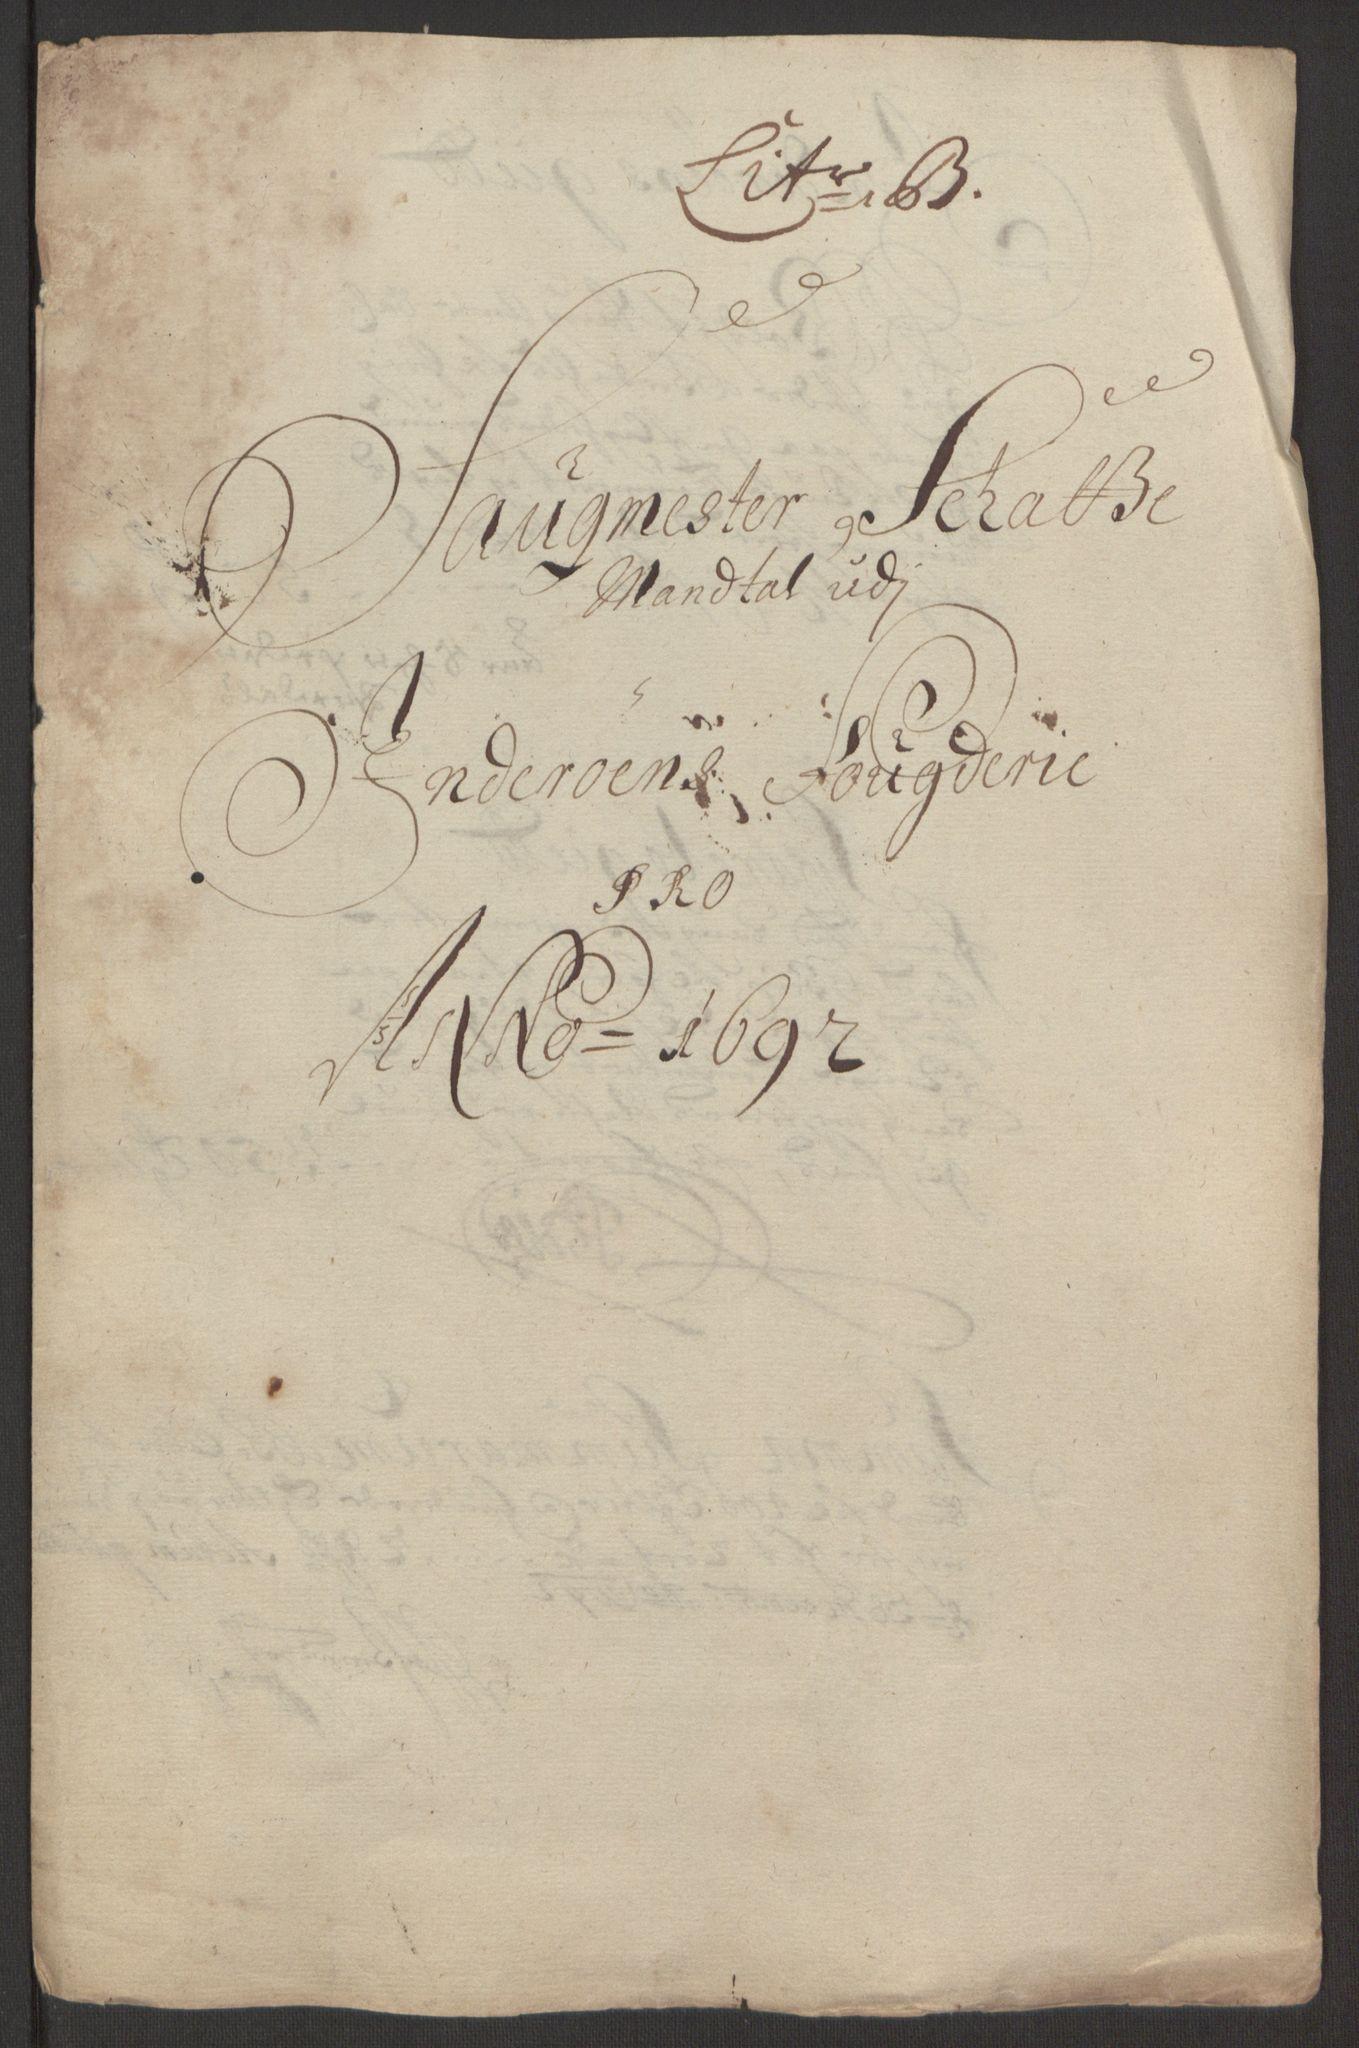 RA, Rentekammeret inntil 1814, Reviderte regnskaper, Fogderegnskap, R63/L4308: Fogderegnskap Inderøy, 1692-1694, s. 71